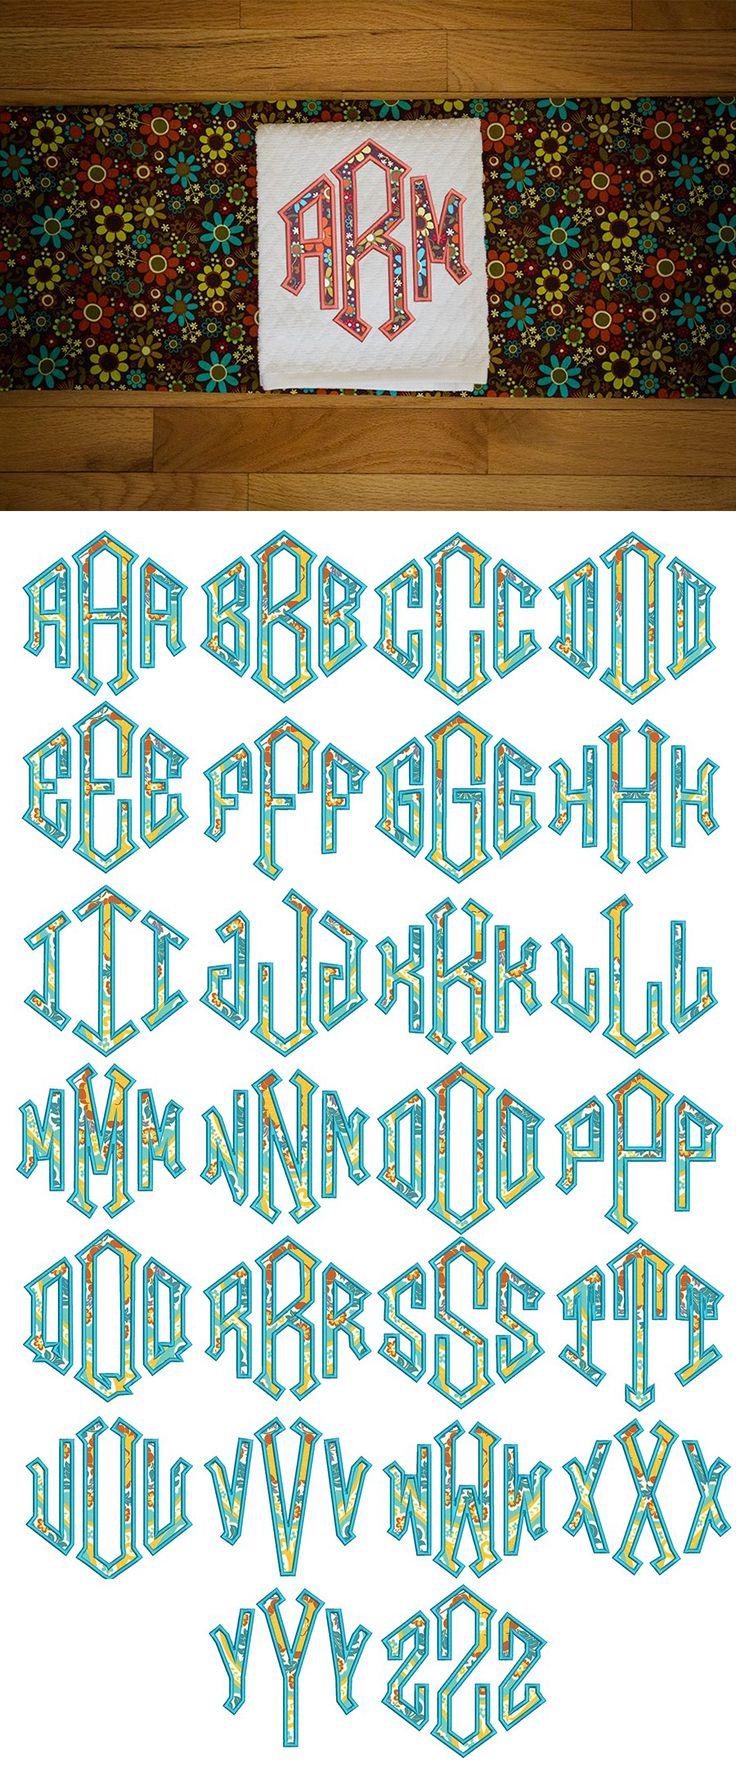 Diamond Applique Monogram design set is available for instant download atdesignsbyjuju.com